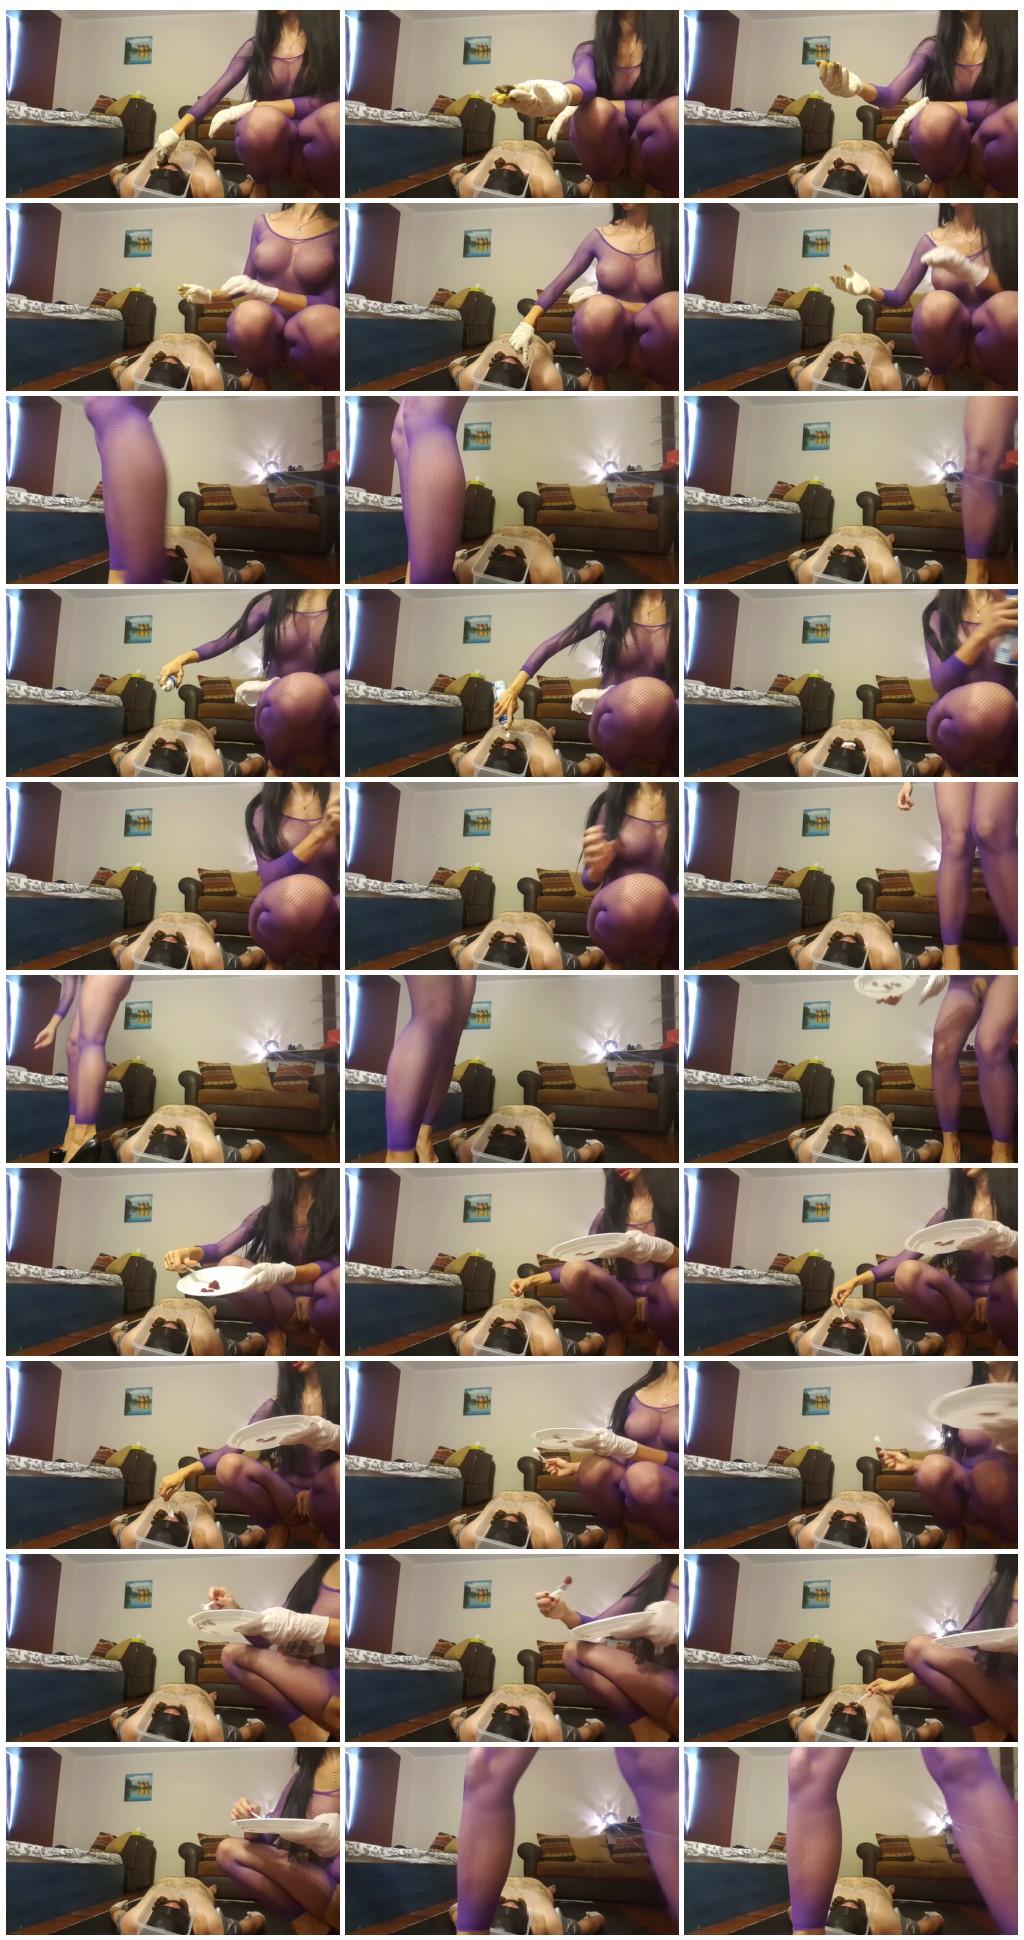 Kaviar whipped cream and raspberry Scat shit Femdom Toilet Slavery Fingering Domination Eat shit thumb - Kaviar, whipped cream and raspberry [Scat,  shit , Femdom ,Toilet Slavery, Fingering, Domination, Eat shit]